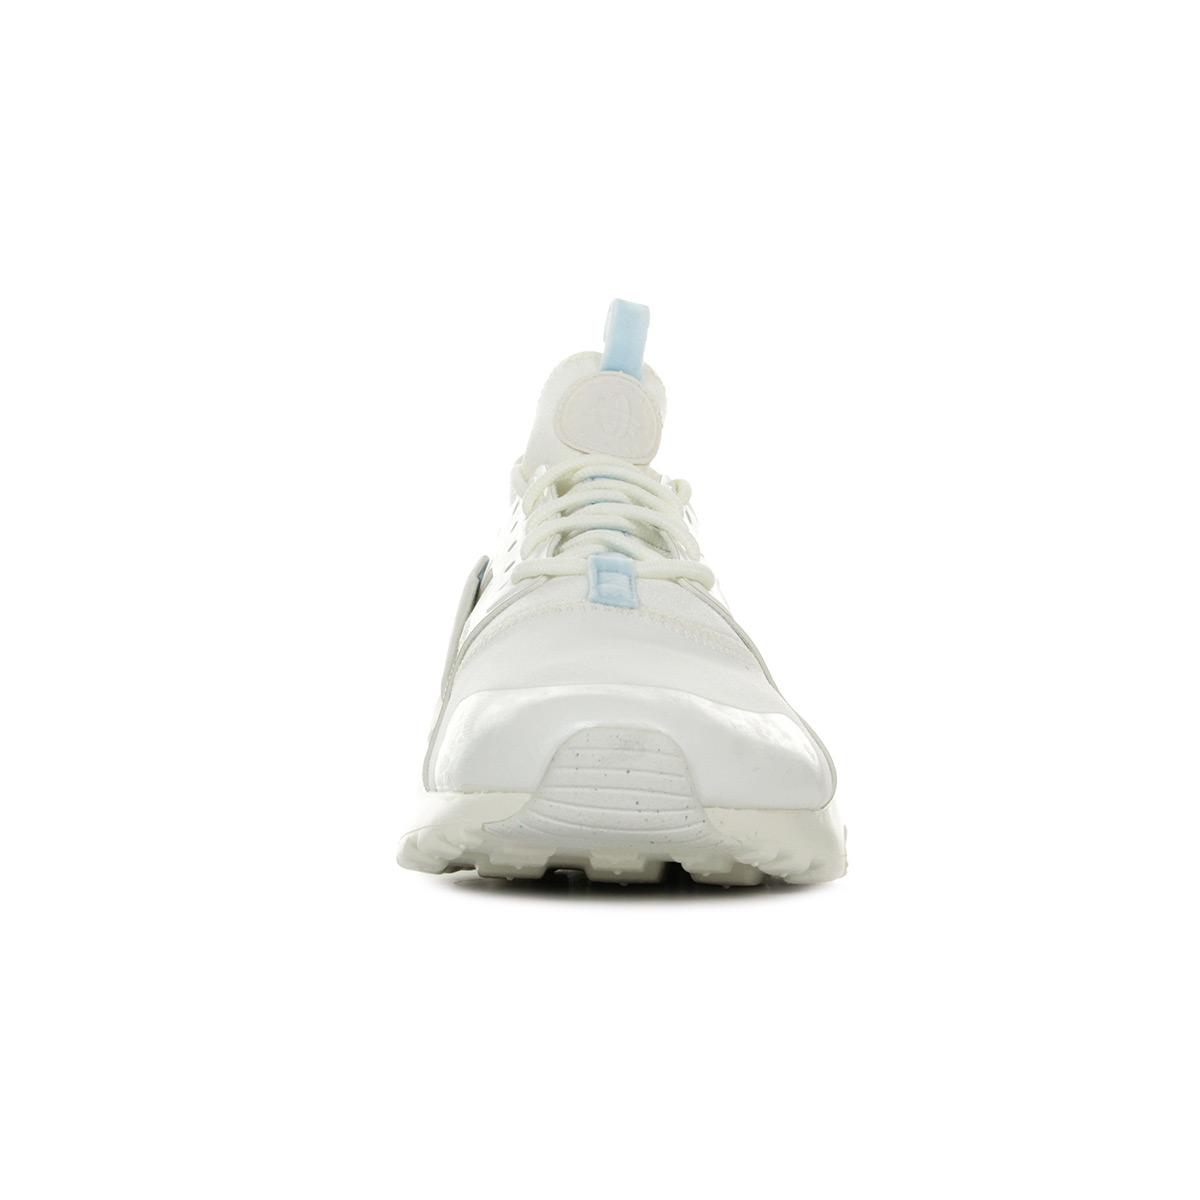 2e1558b904301 Chaussures Baskets Nike fille Huarache Run Ultra GS taille Beige ...